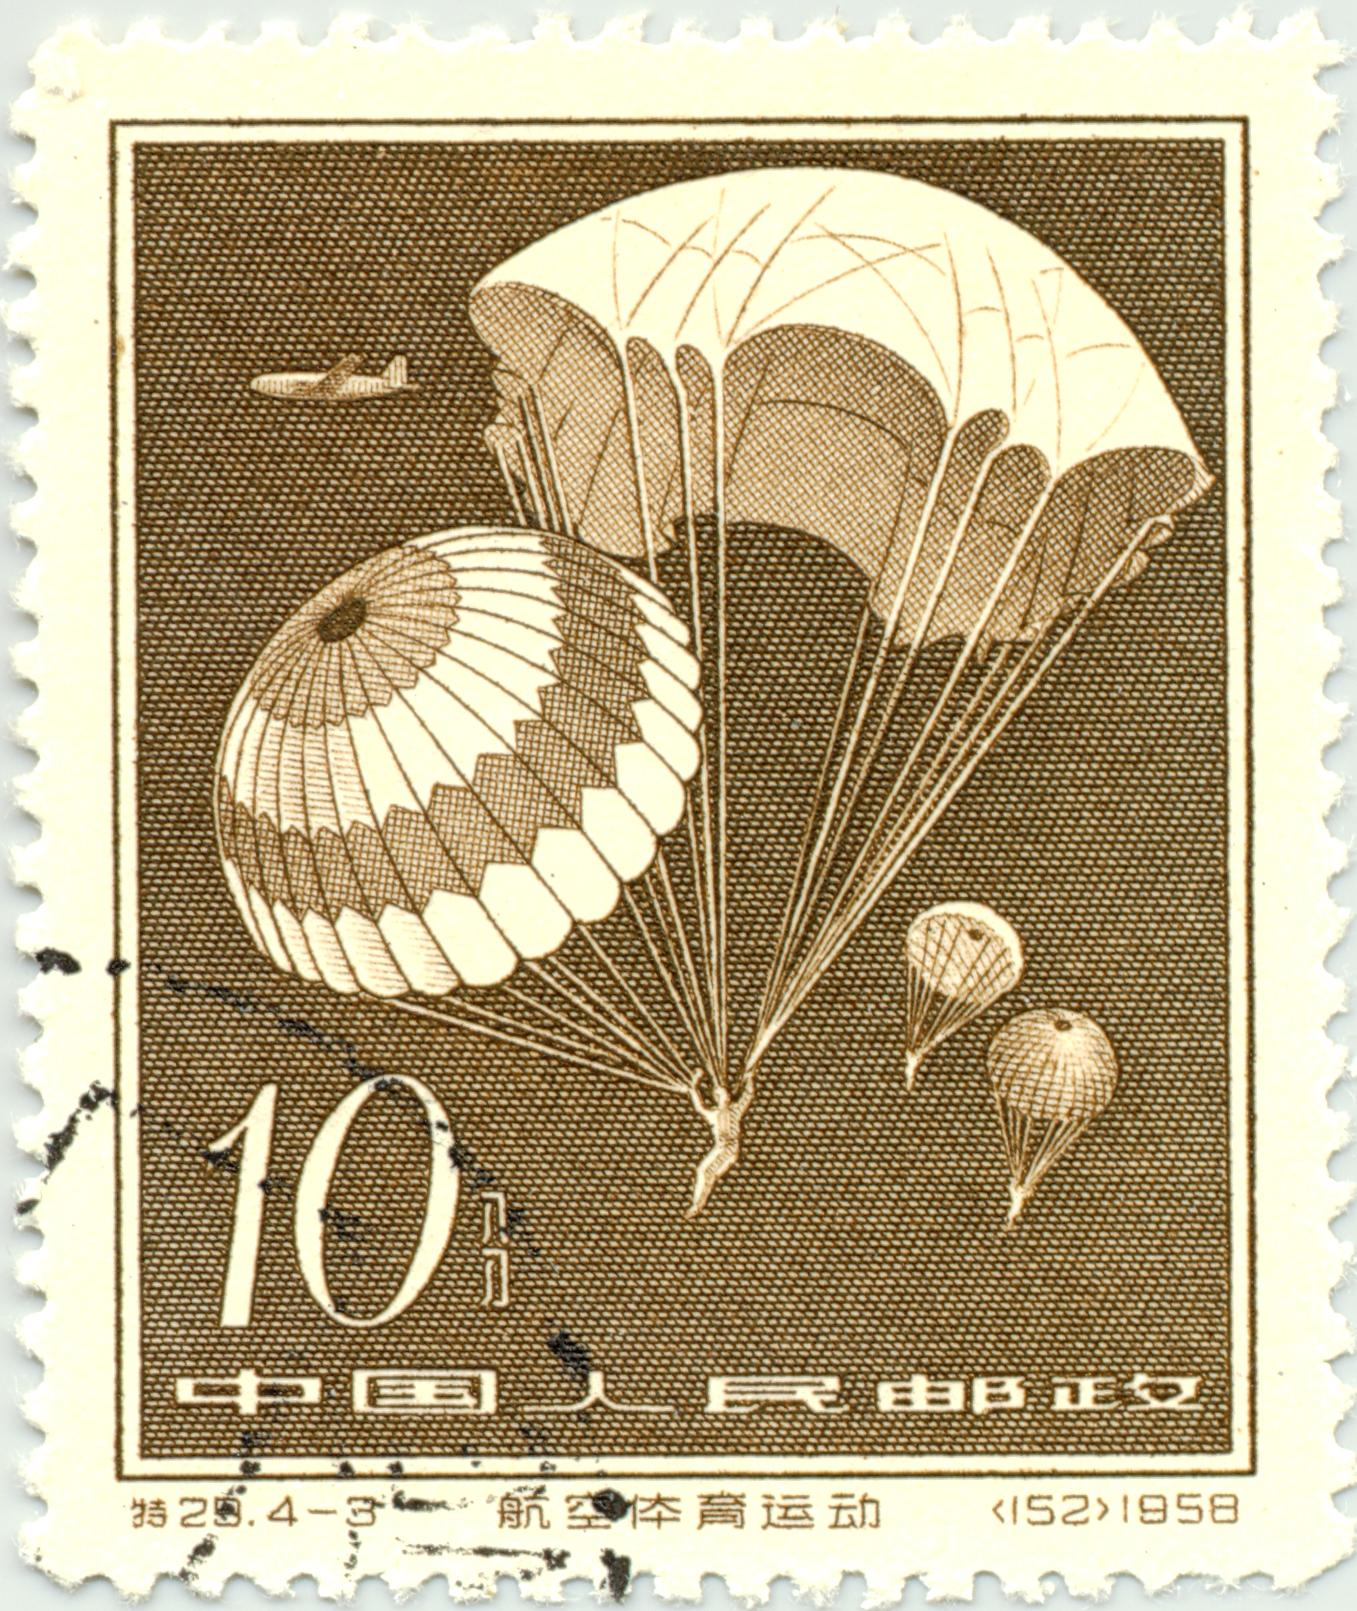 FileStamp China 1958 10 Parachutes